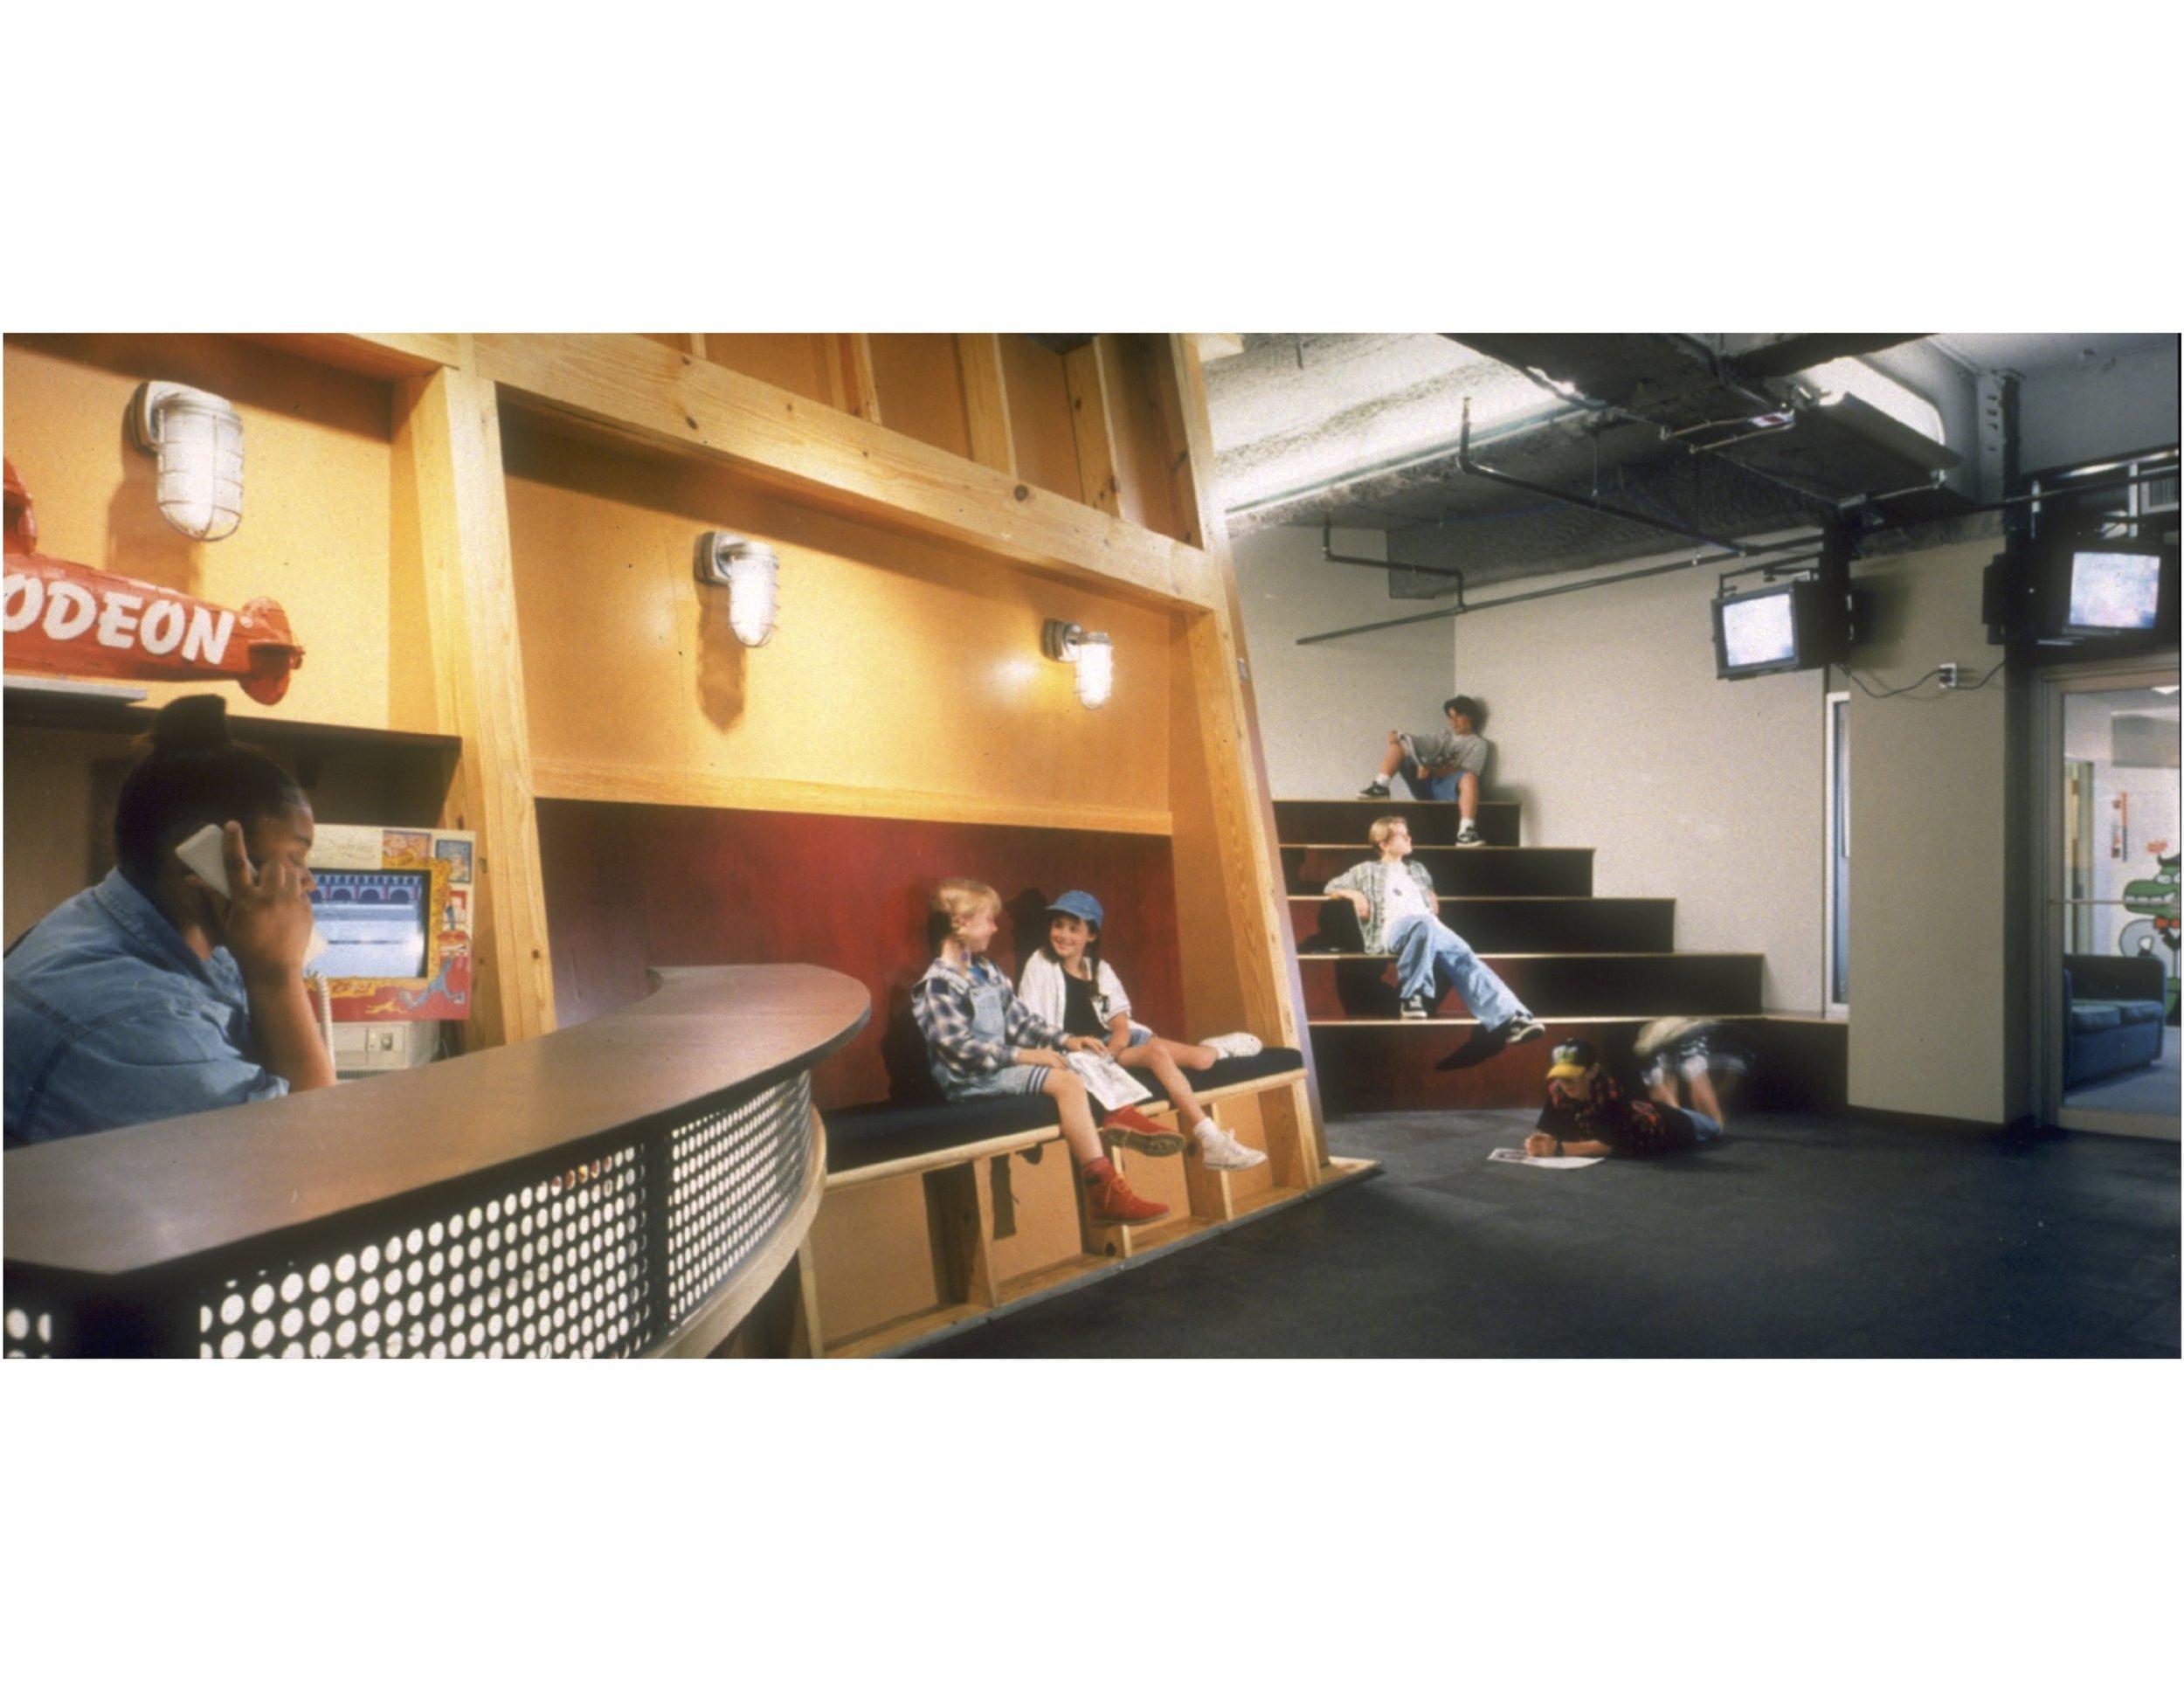 01 nick_02_wait room.jpg